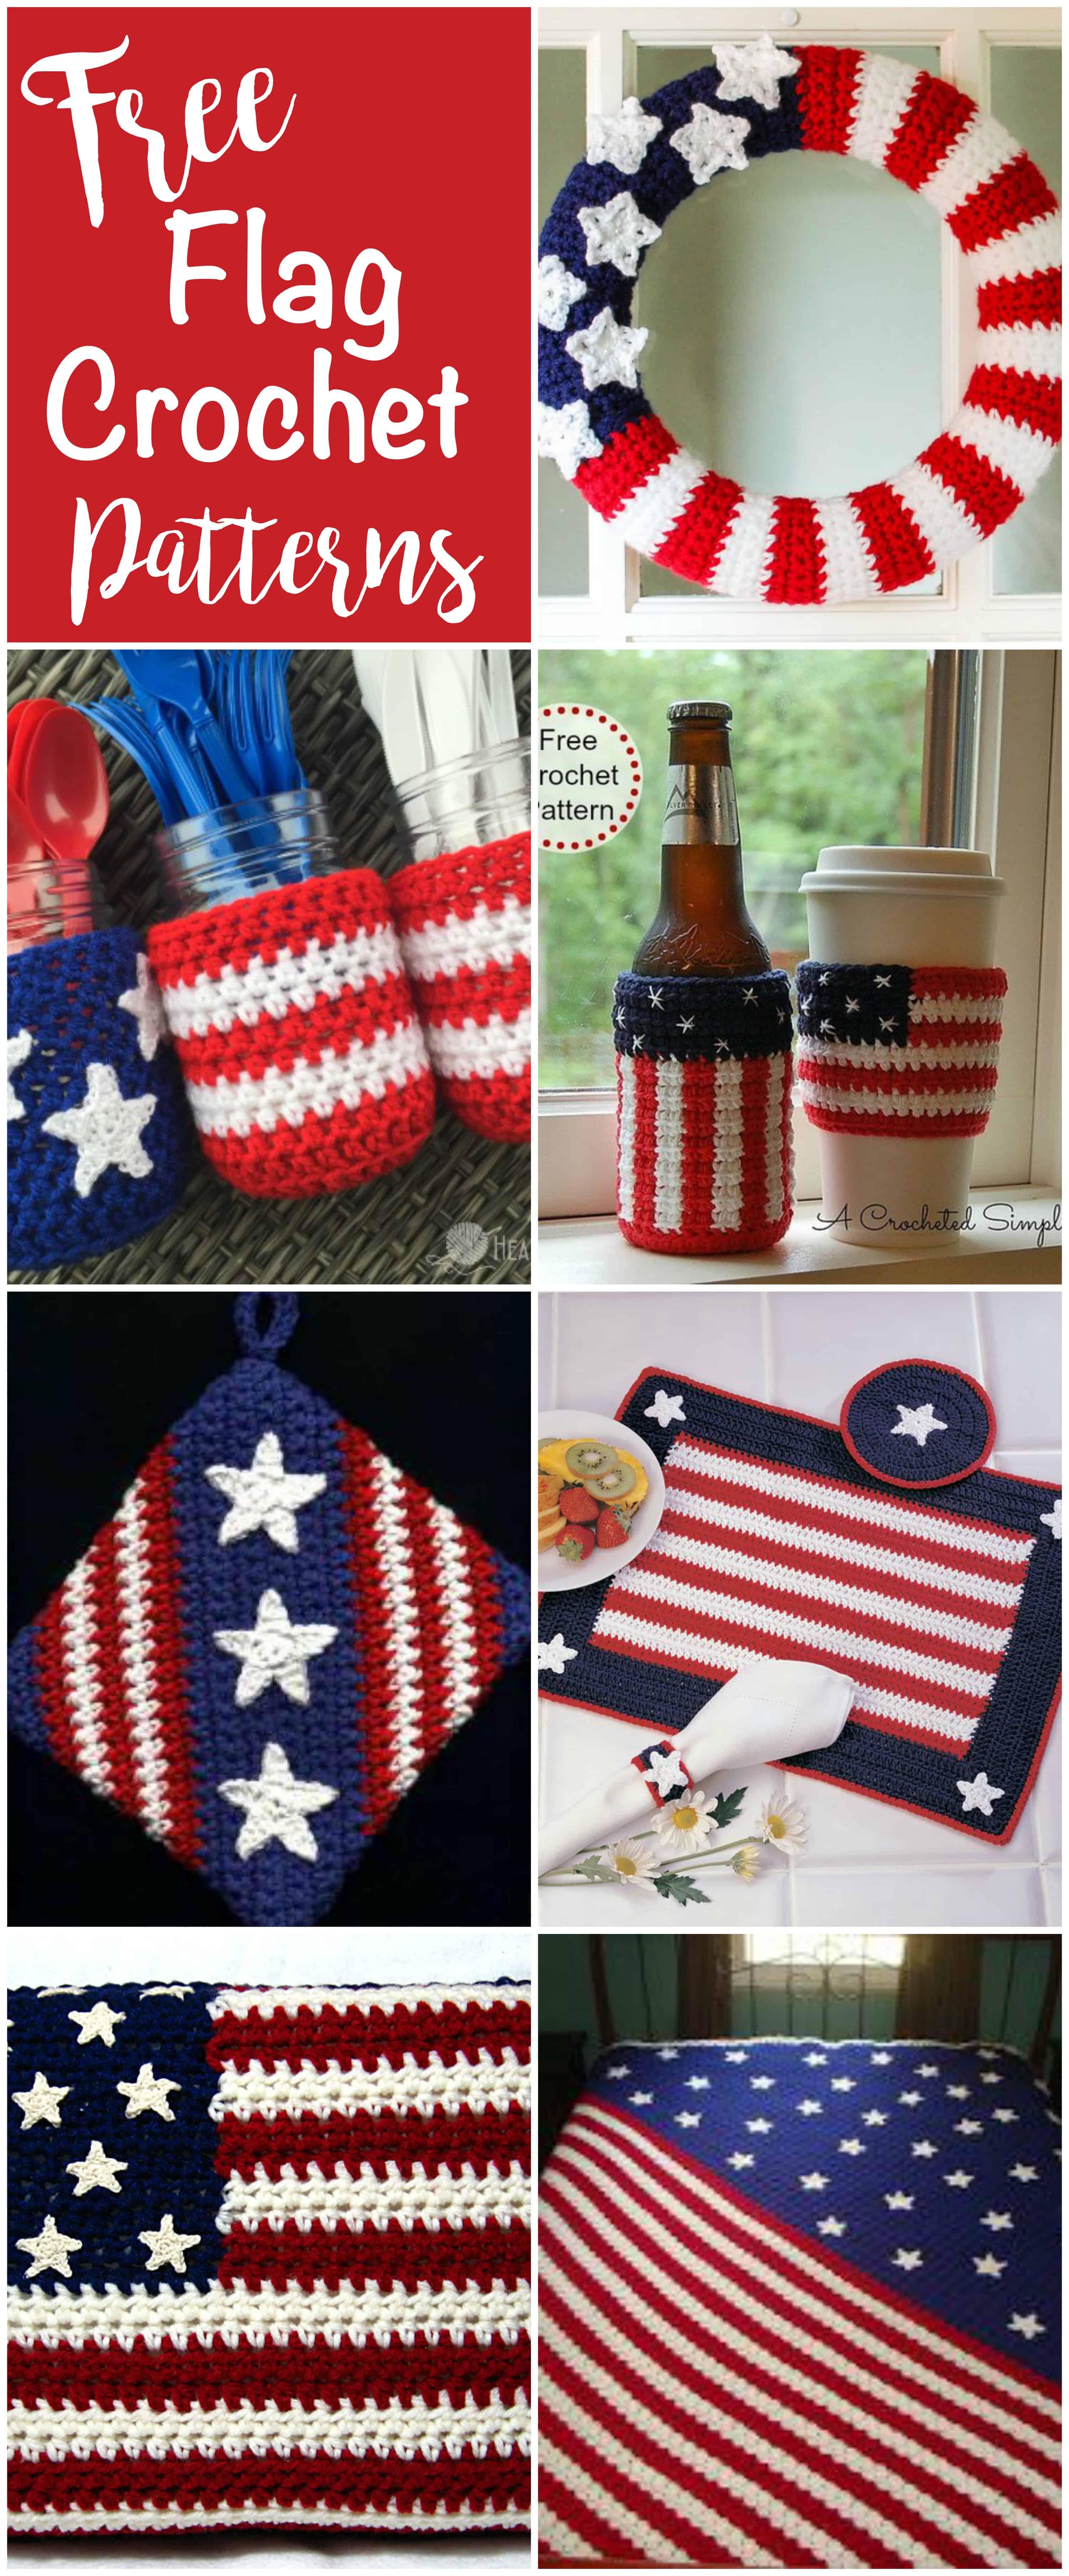 Free Flag Crochet Patterns - Crochet 365 Knit Too